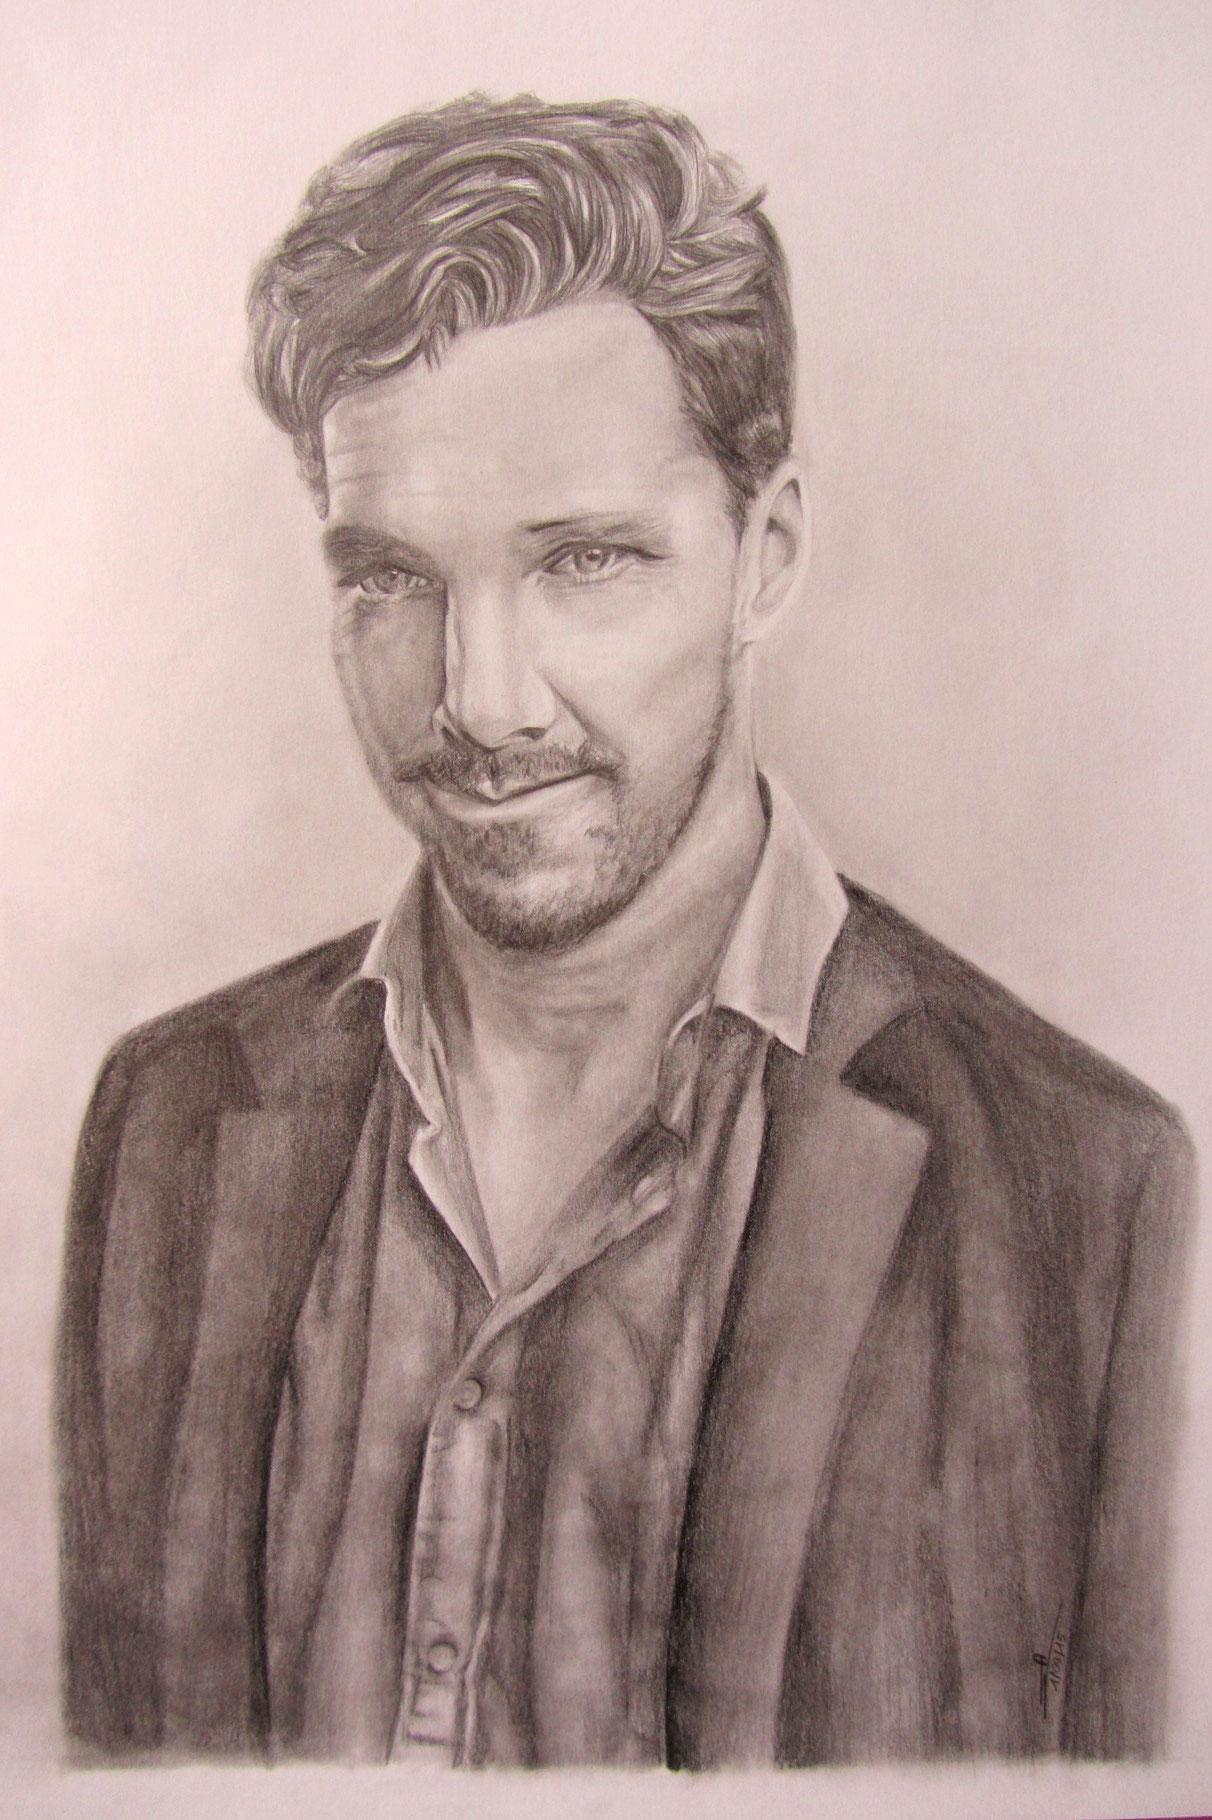 2015 - Commande - Benedict Cumberbatch - A3 - Crayon